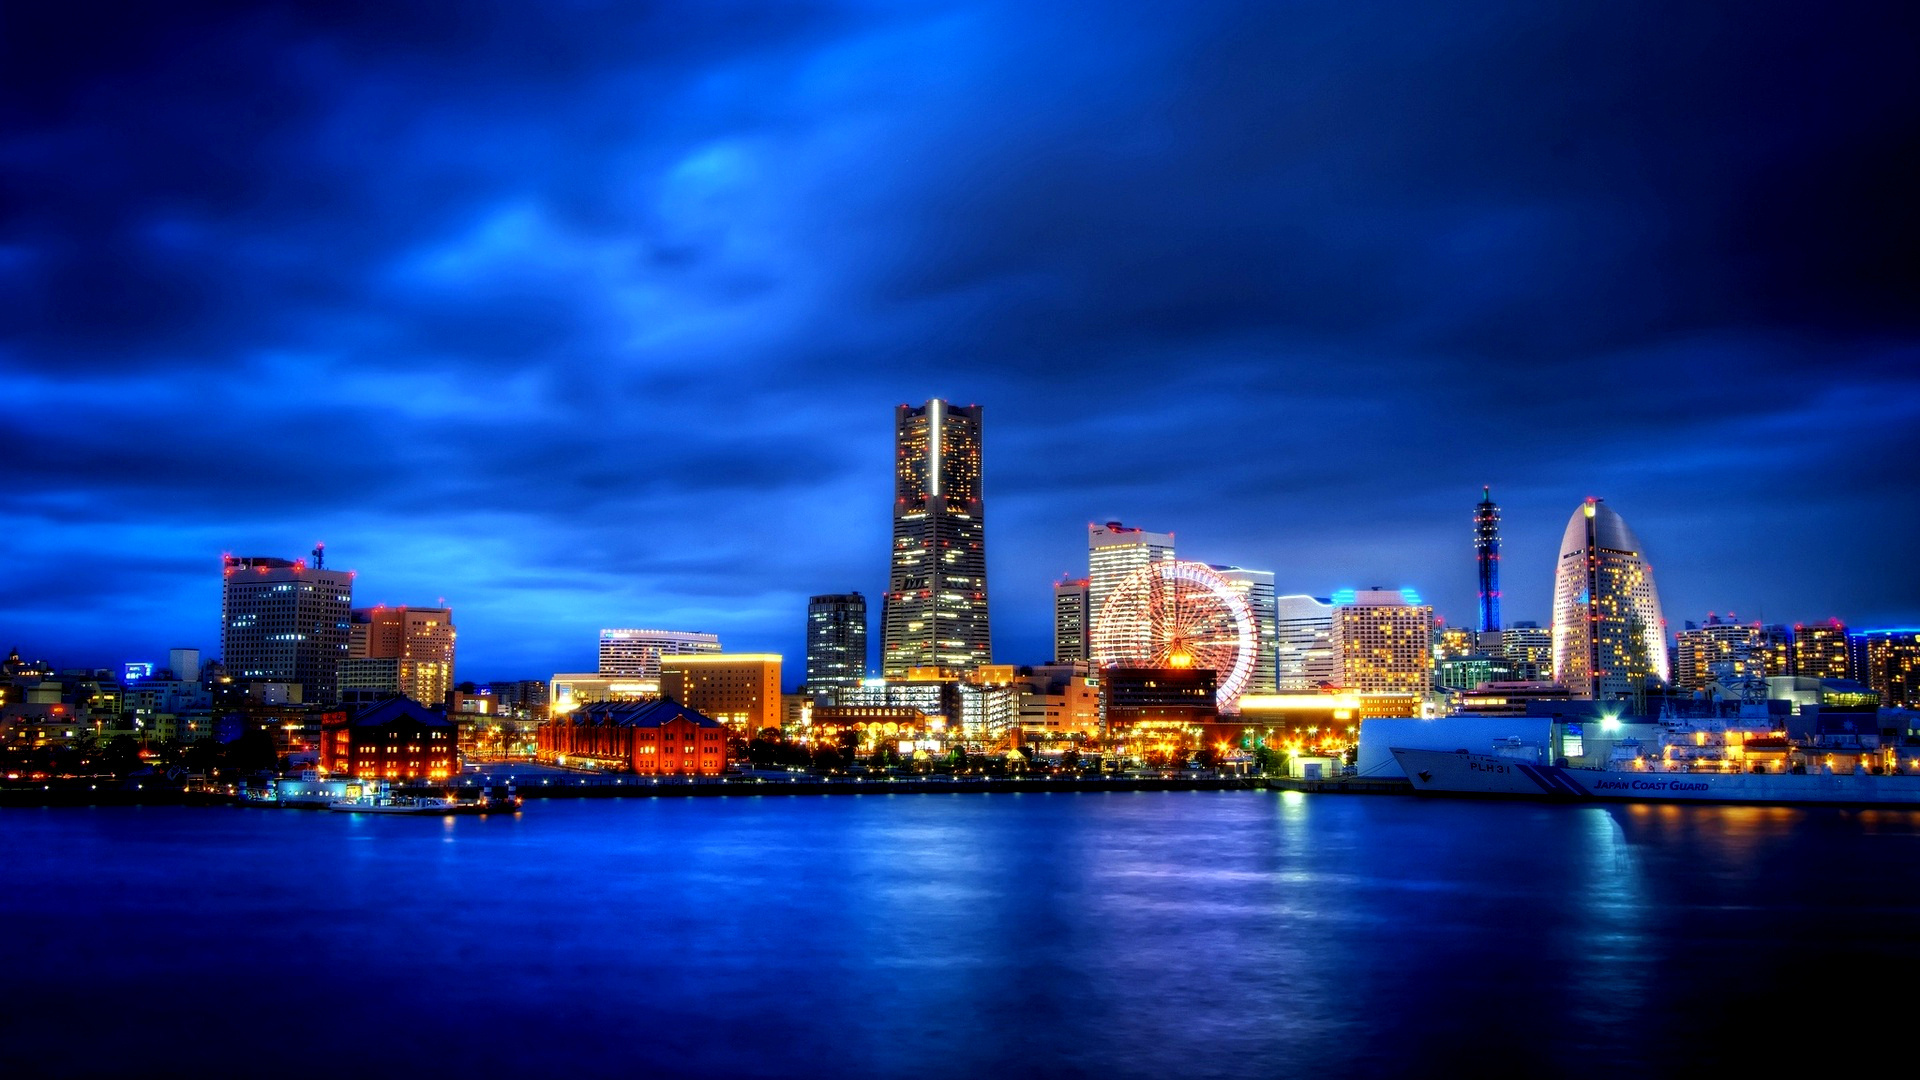 city_ocean_landscape_night_blue_sky_travel_world_hd_wallpaper_1920x1080